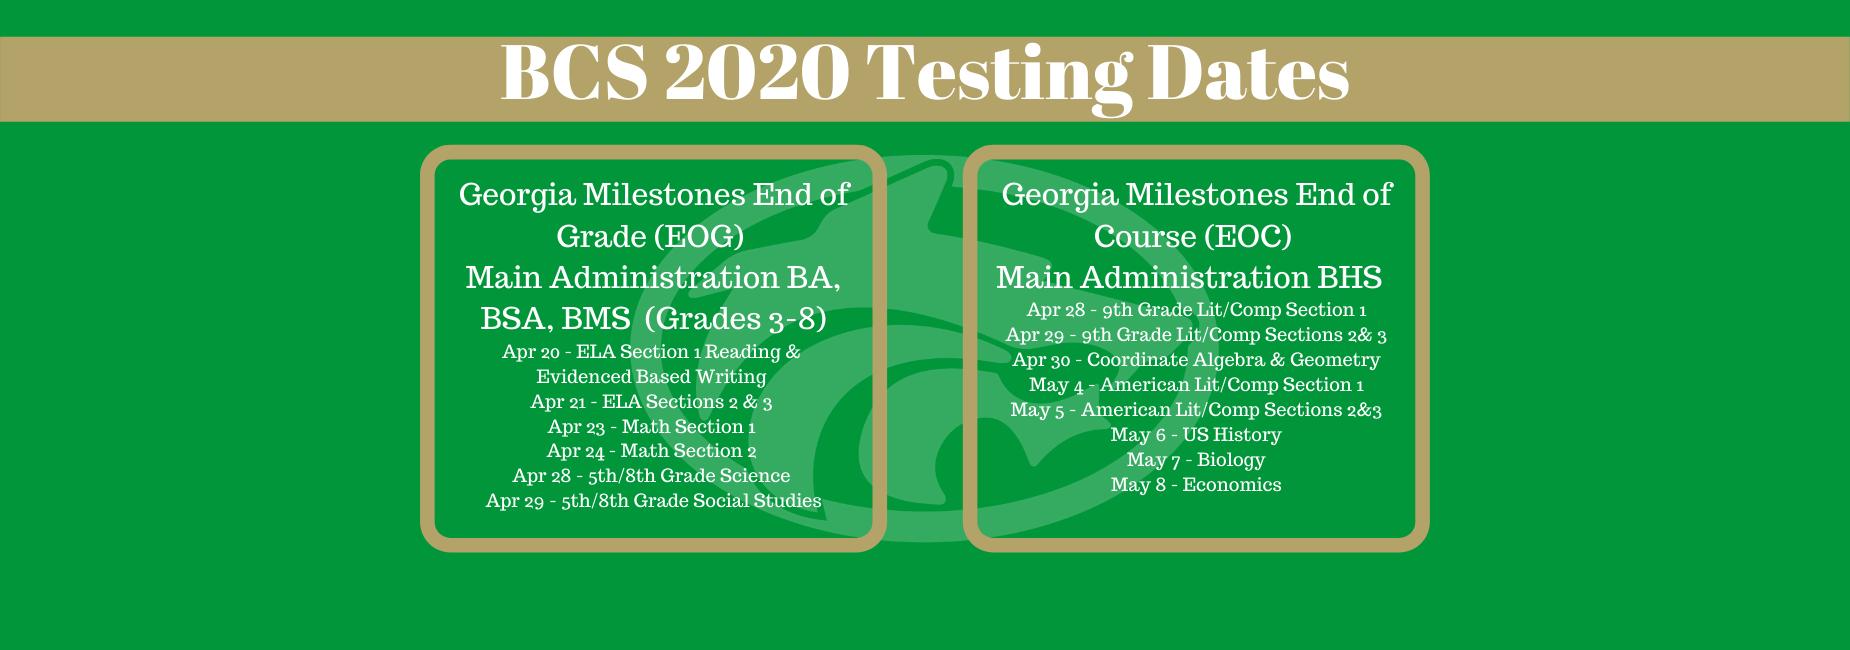 BCS 2020 Testing Dates